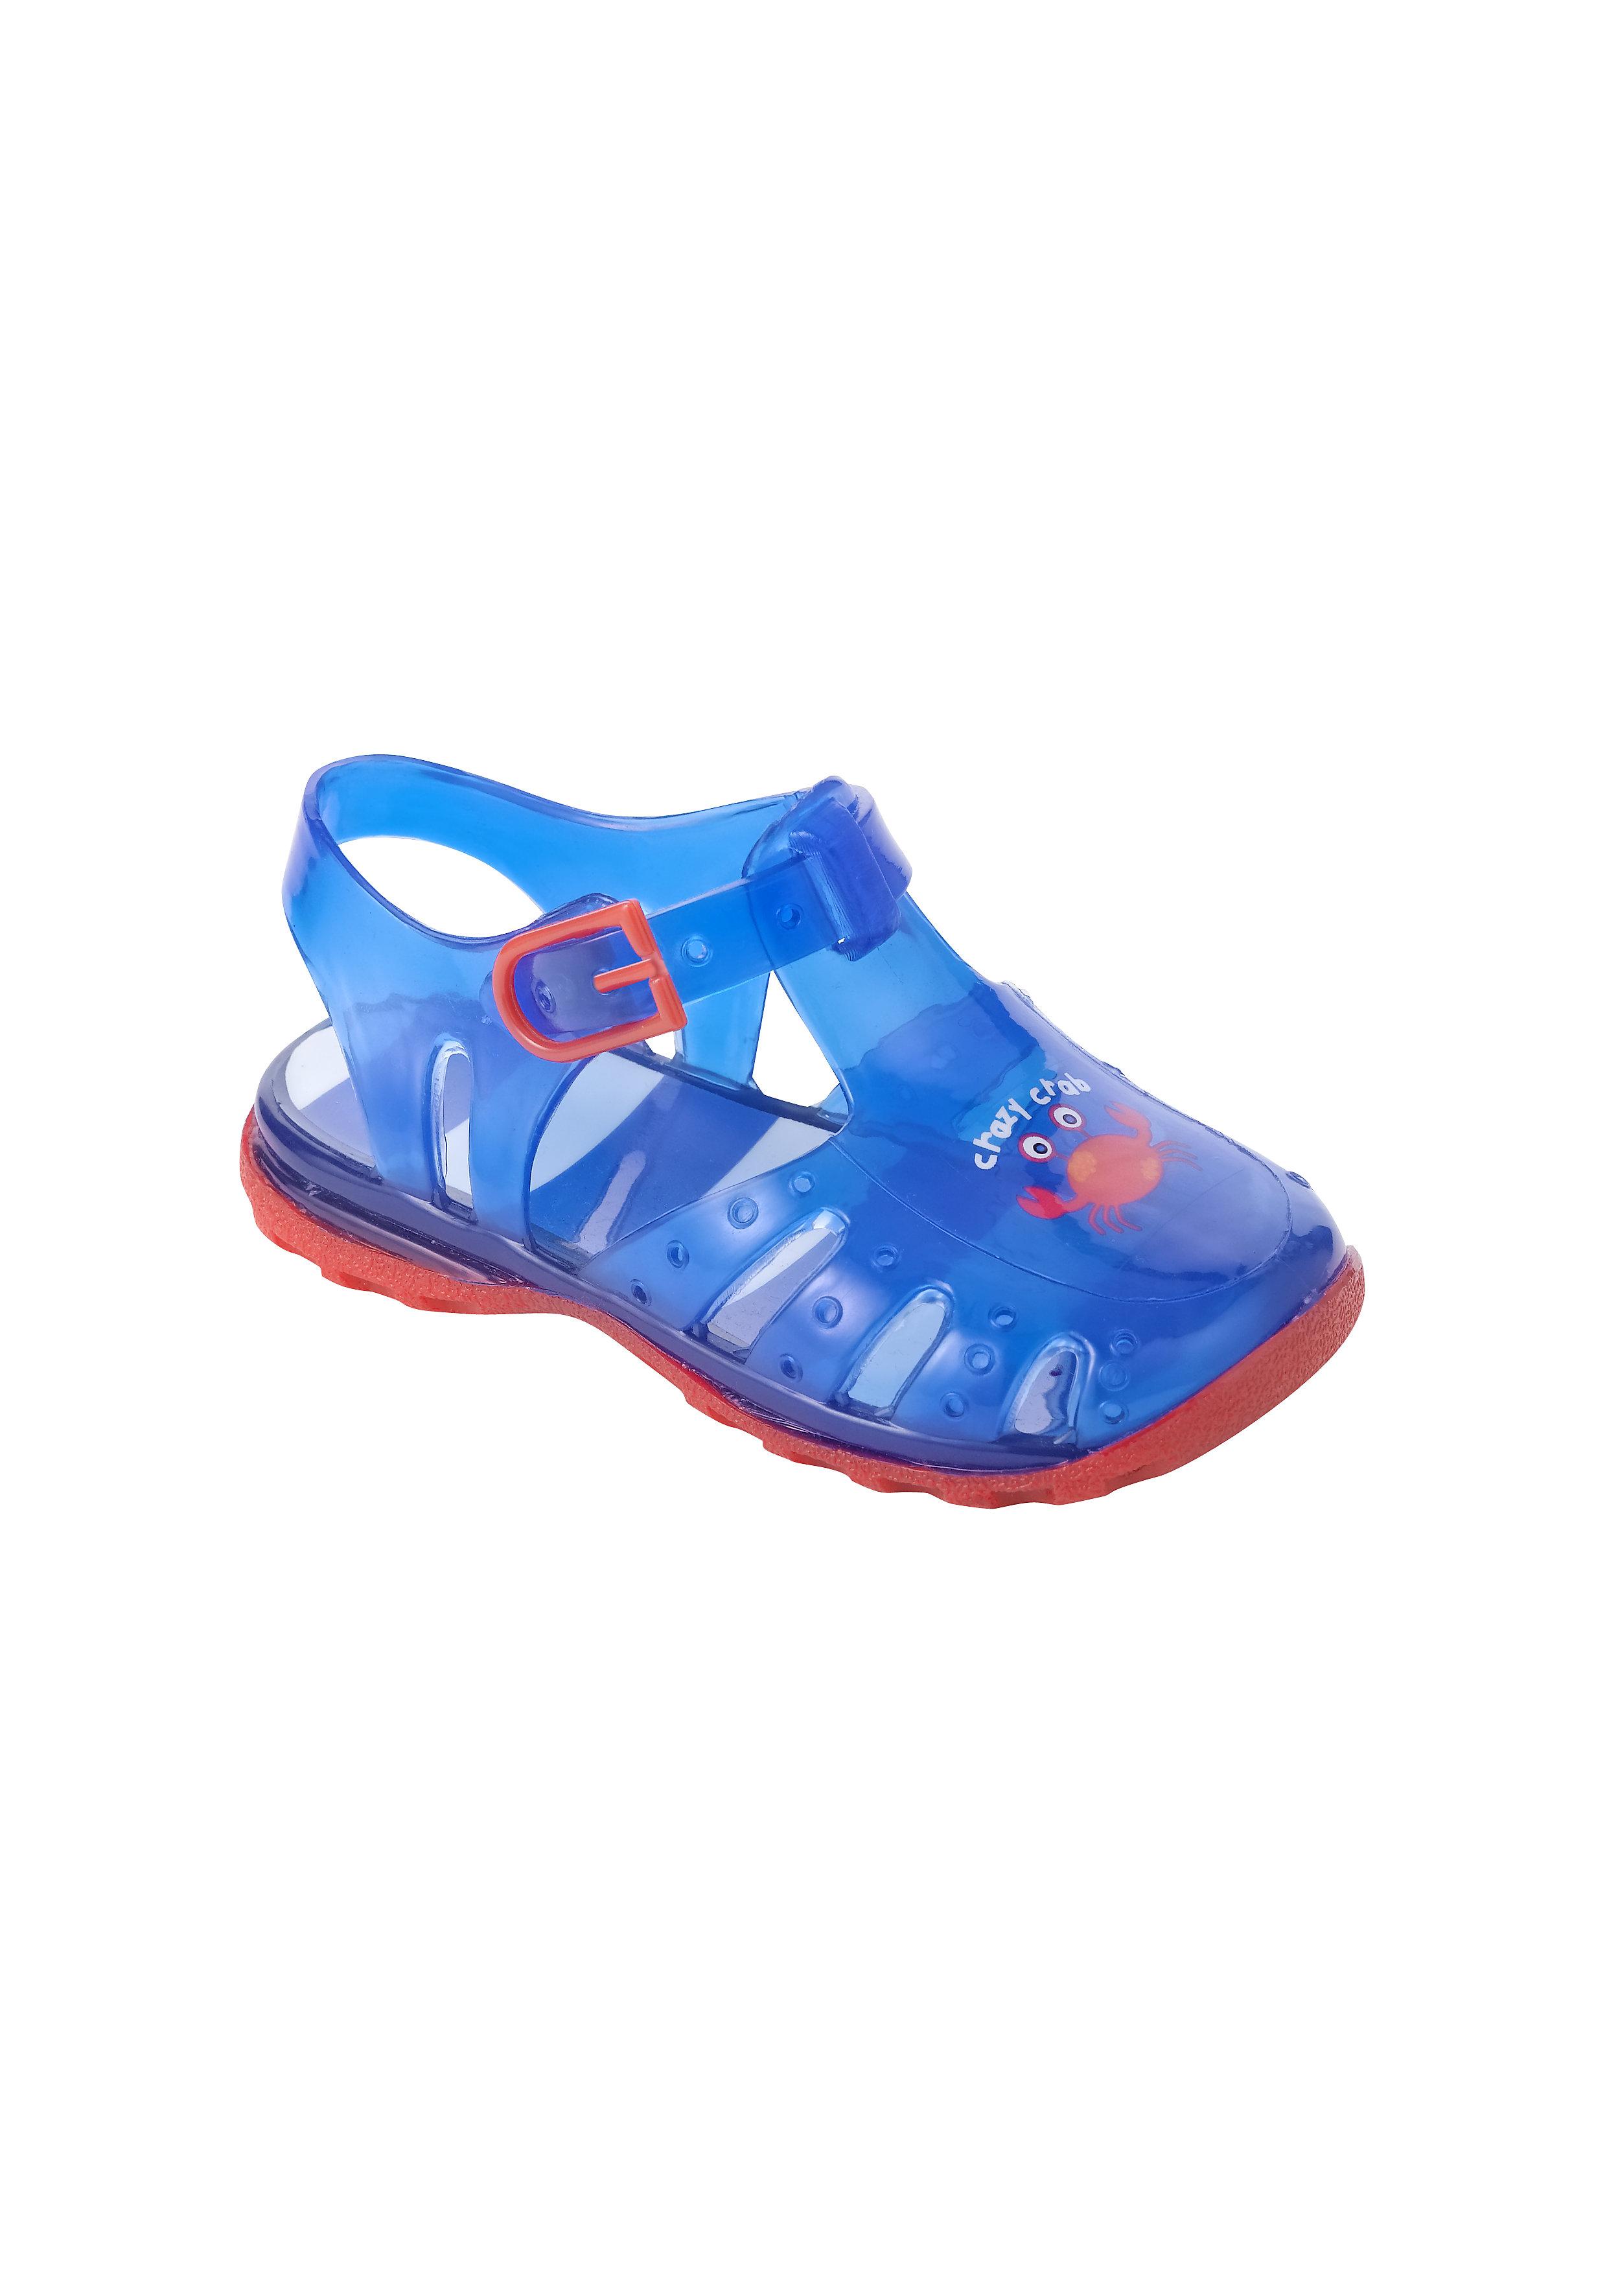 Mothercare | Boys Sandals Crab Print - Blue